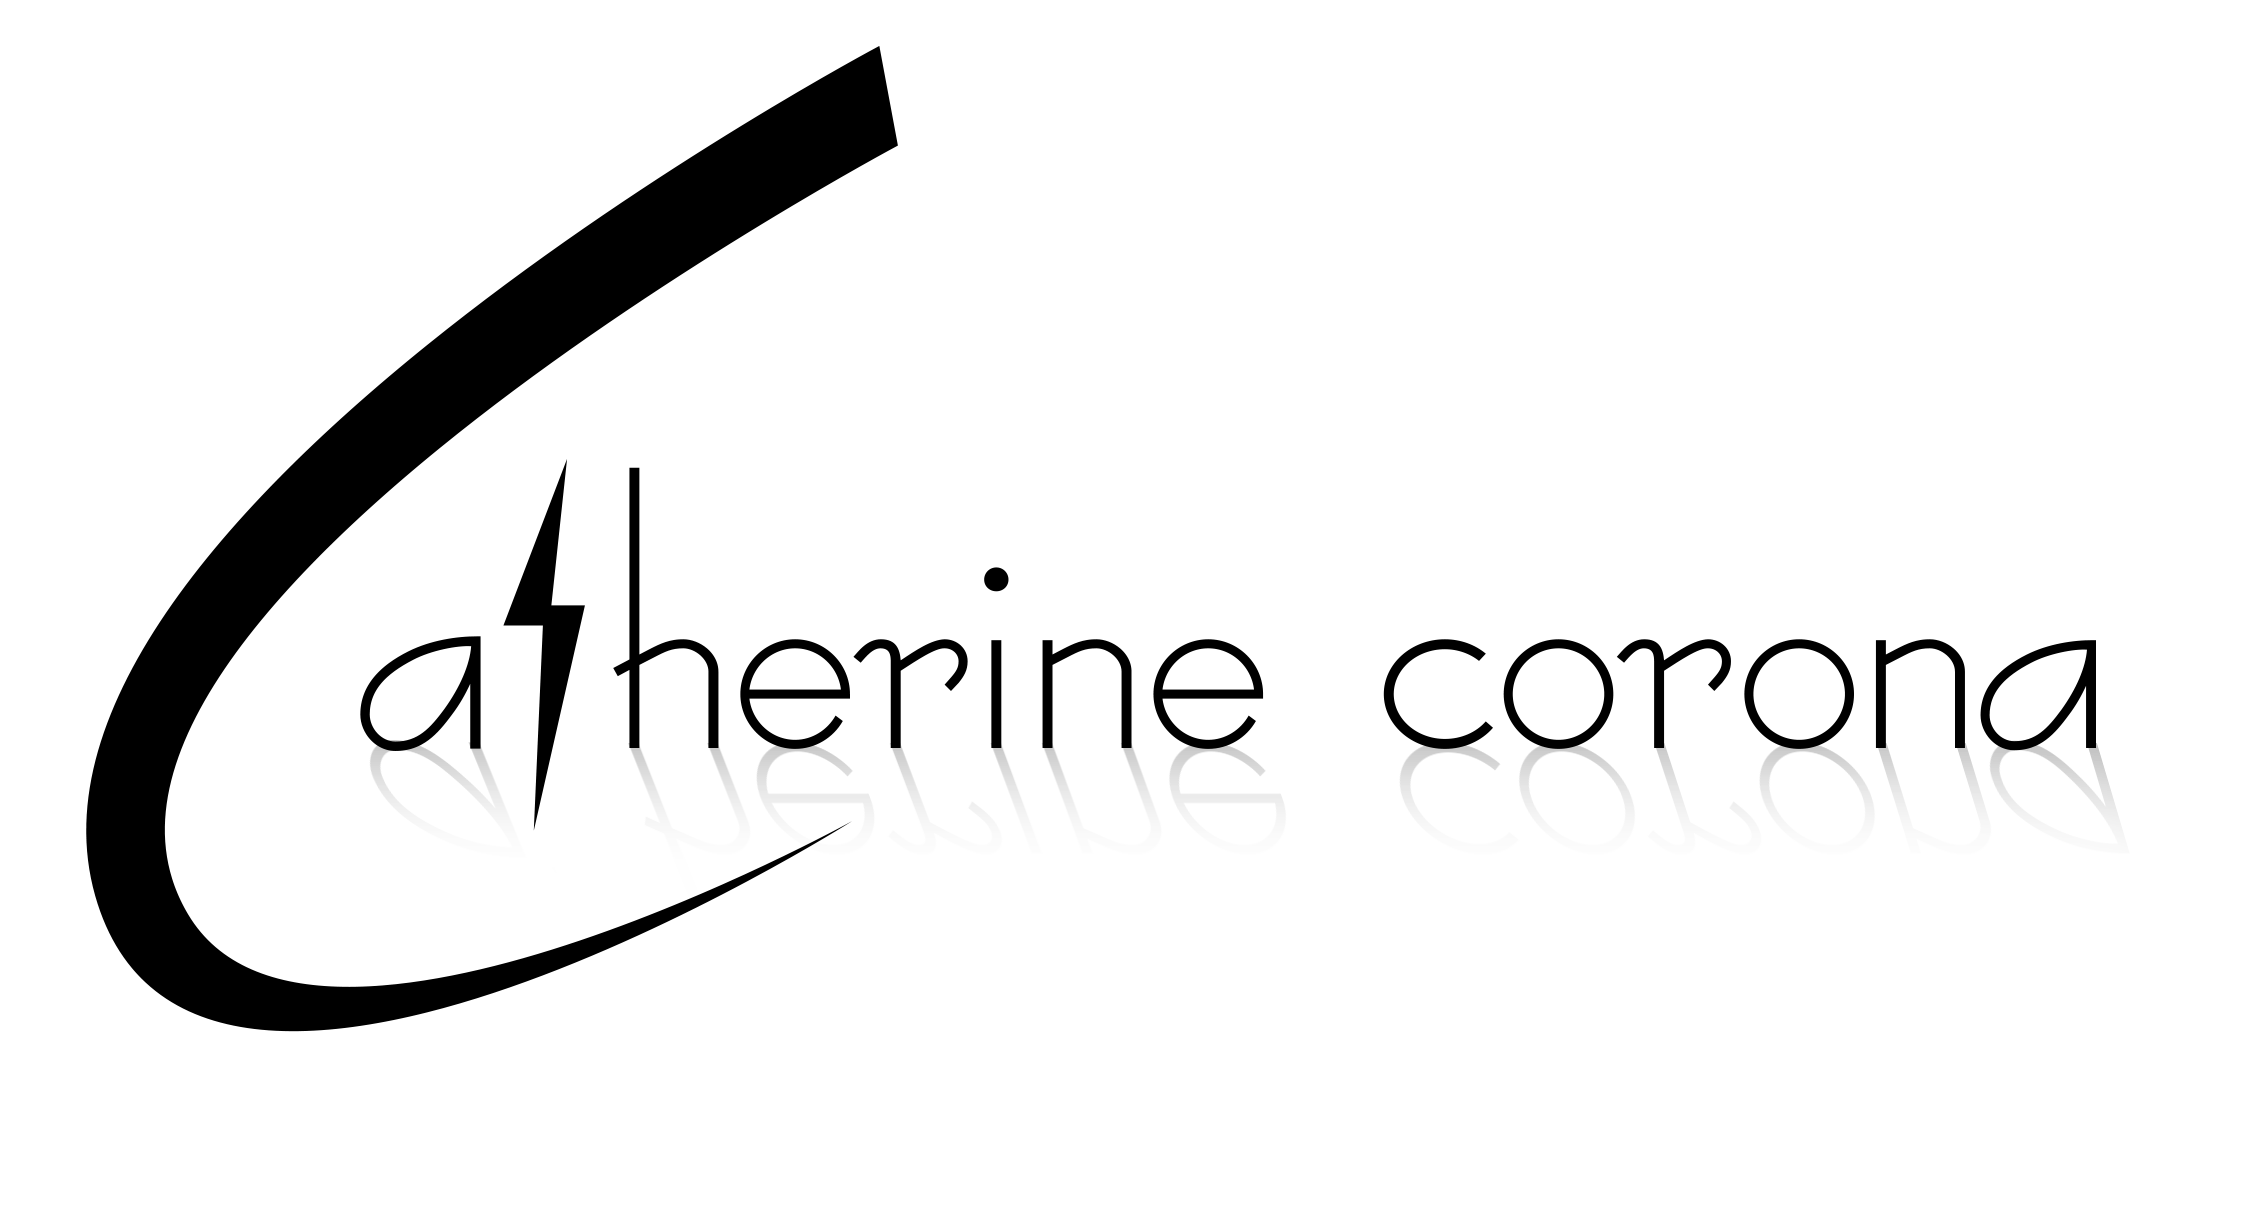 CC_logo_reflection.png